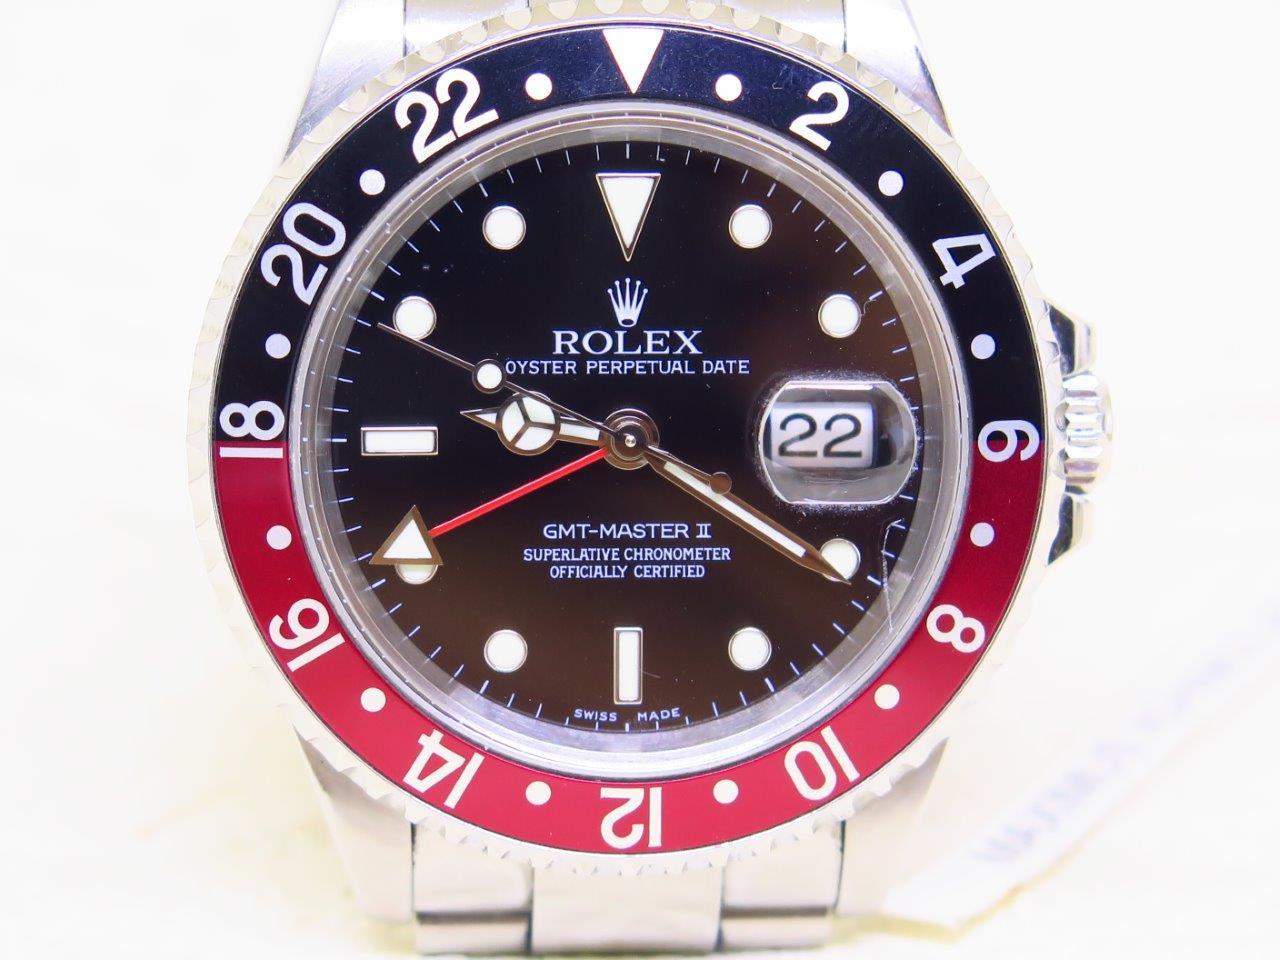 ROLEX GMT MASTER II COKE BEZEL - ROLEX 16710 - SERIE F YEAR 2003 NO PIN HOLE